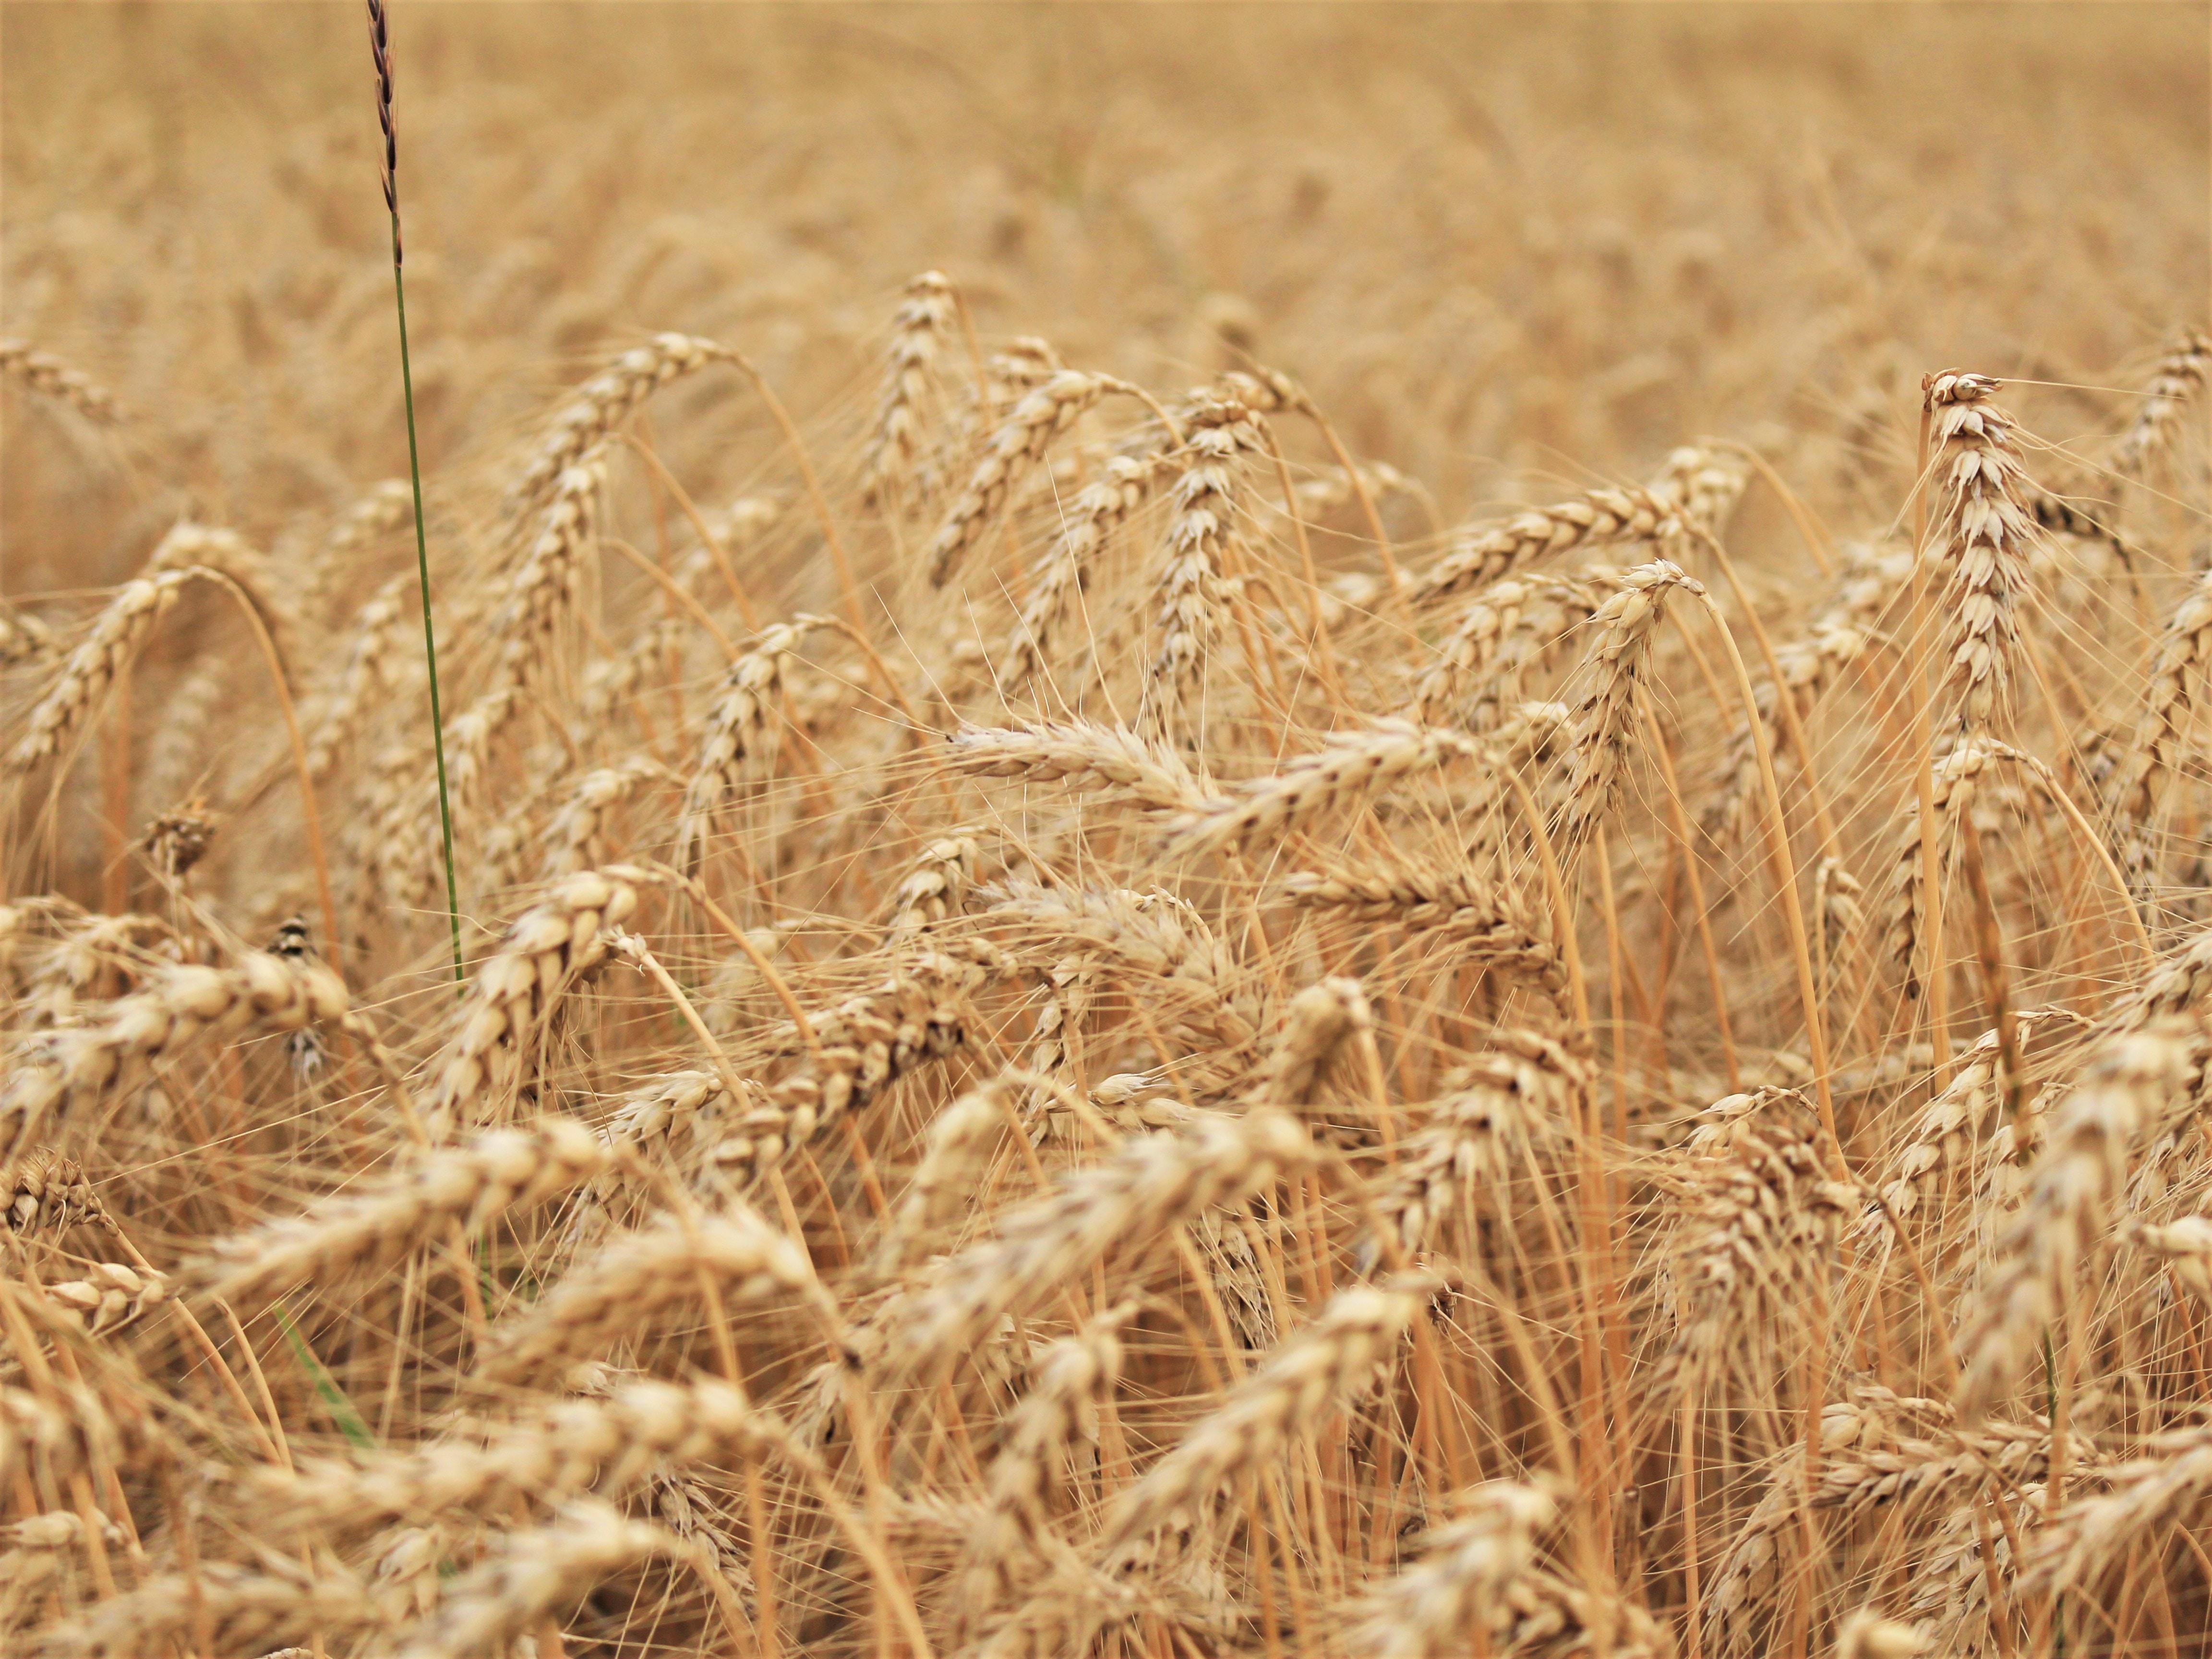 close-up photo of wheat field